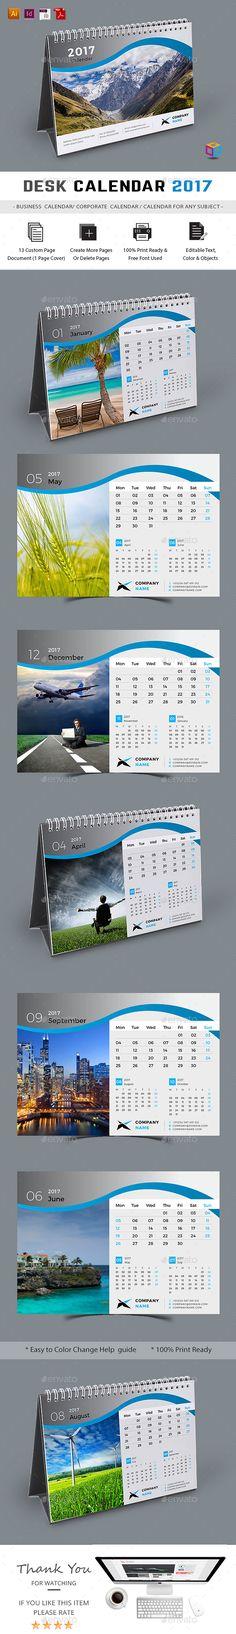 Desk Calendar 2017 Template InDesign INDD, AI Illustrator                                                                                                                                                                                 More